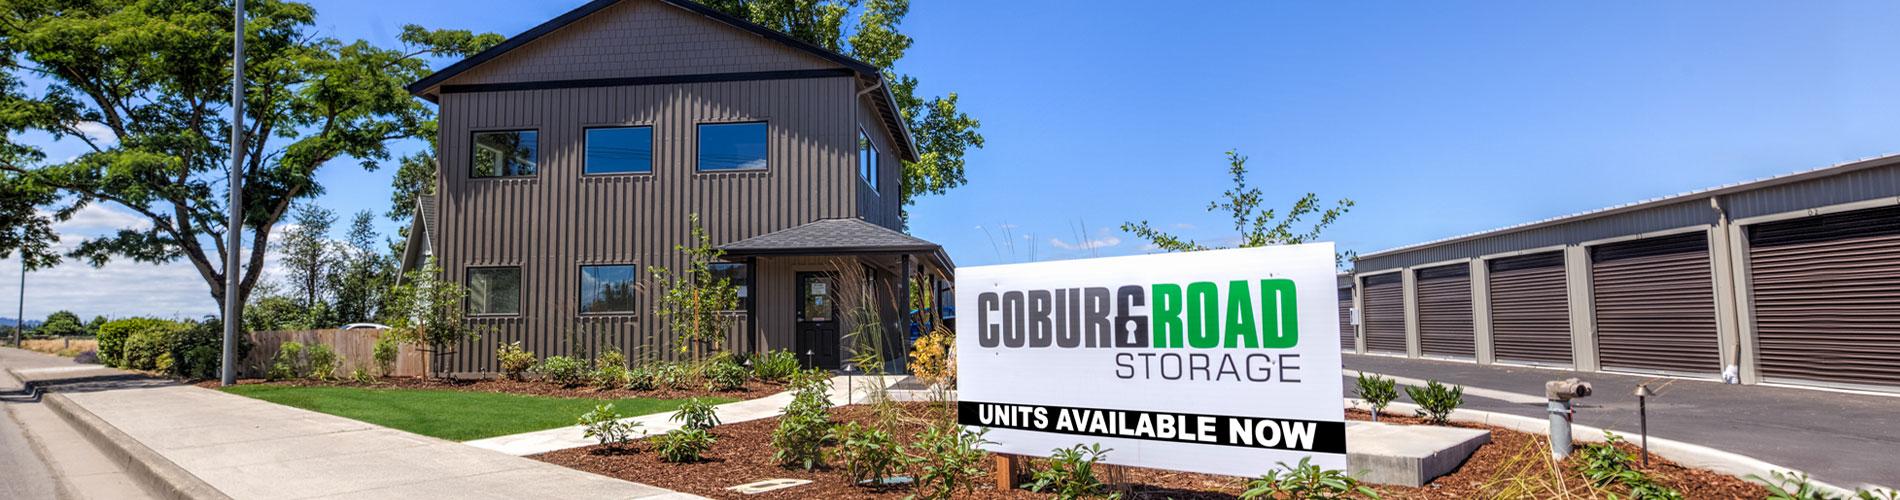 Coburg Road Storage Self Storage In Eugene Or Home